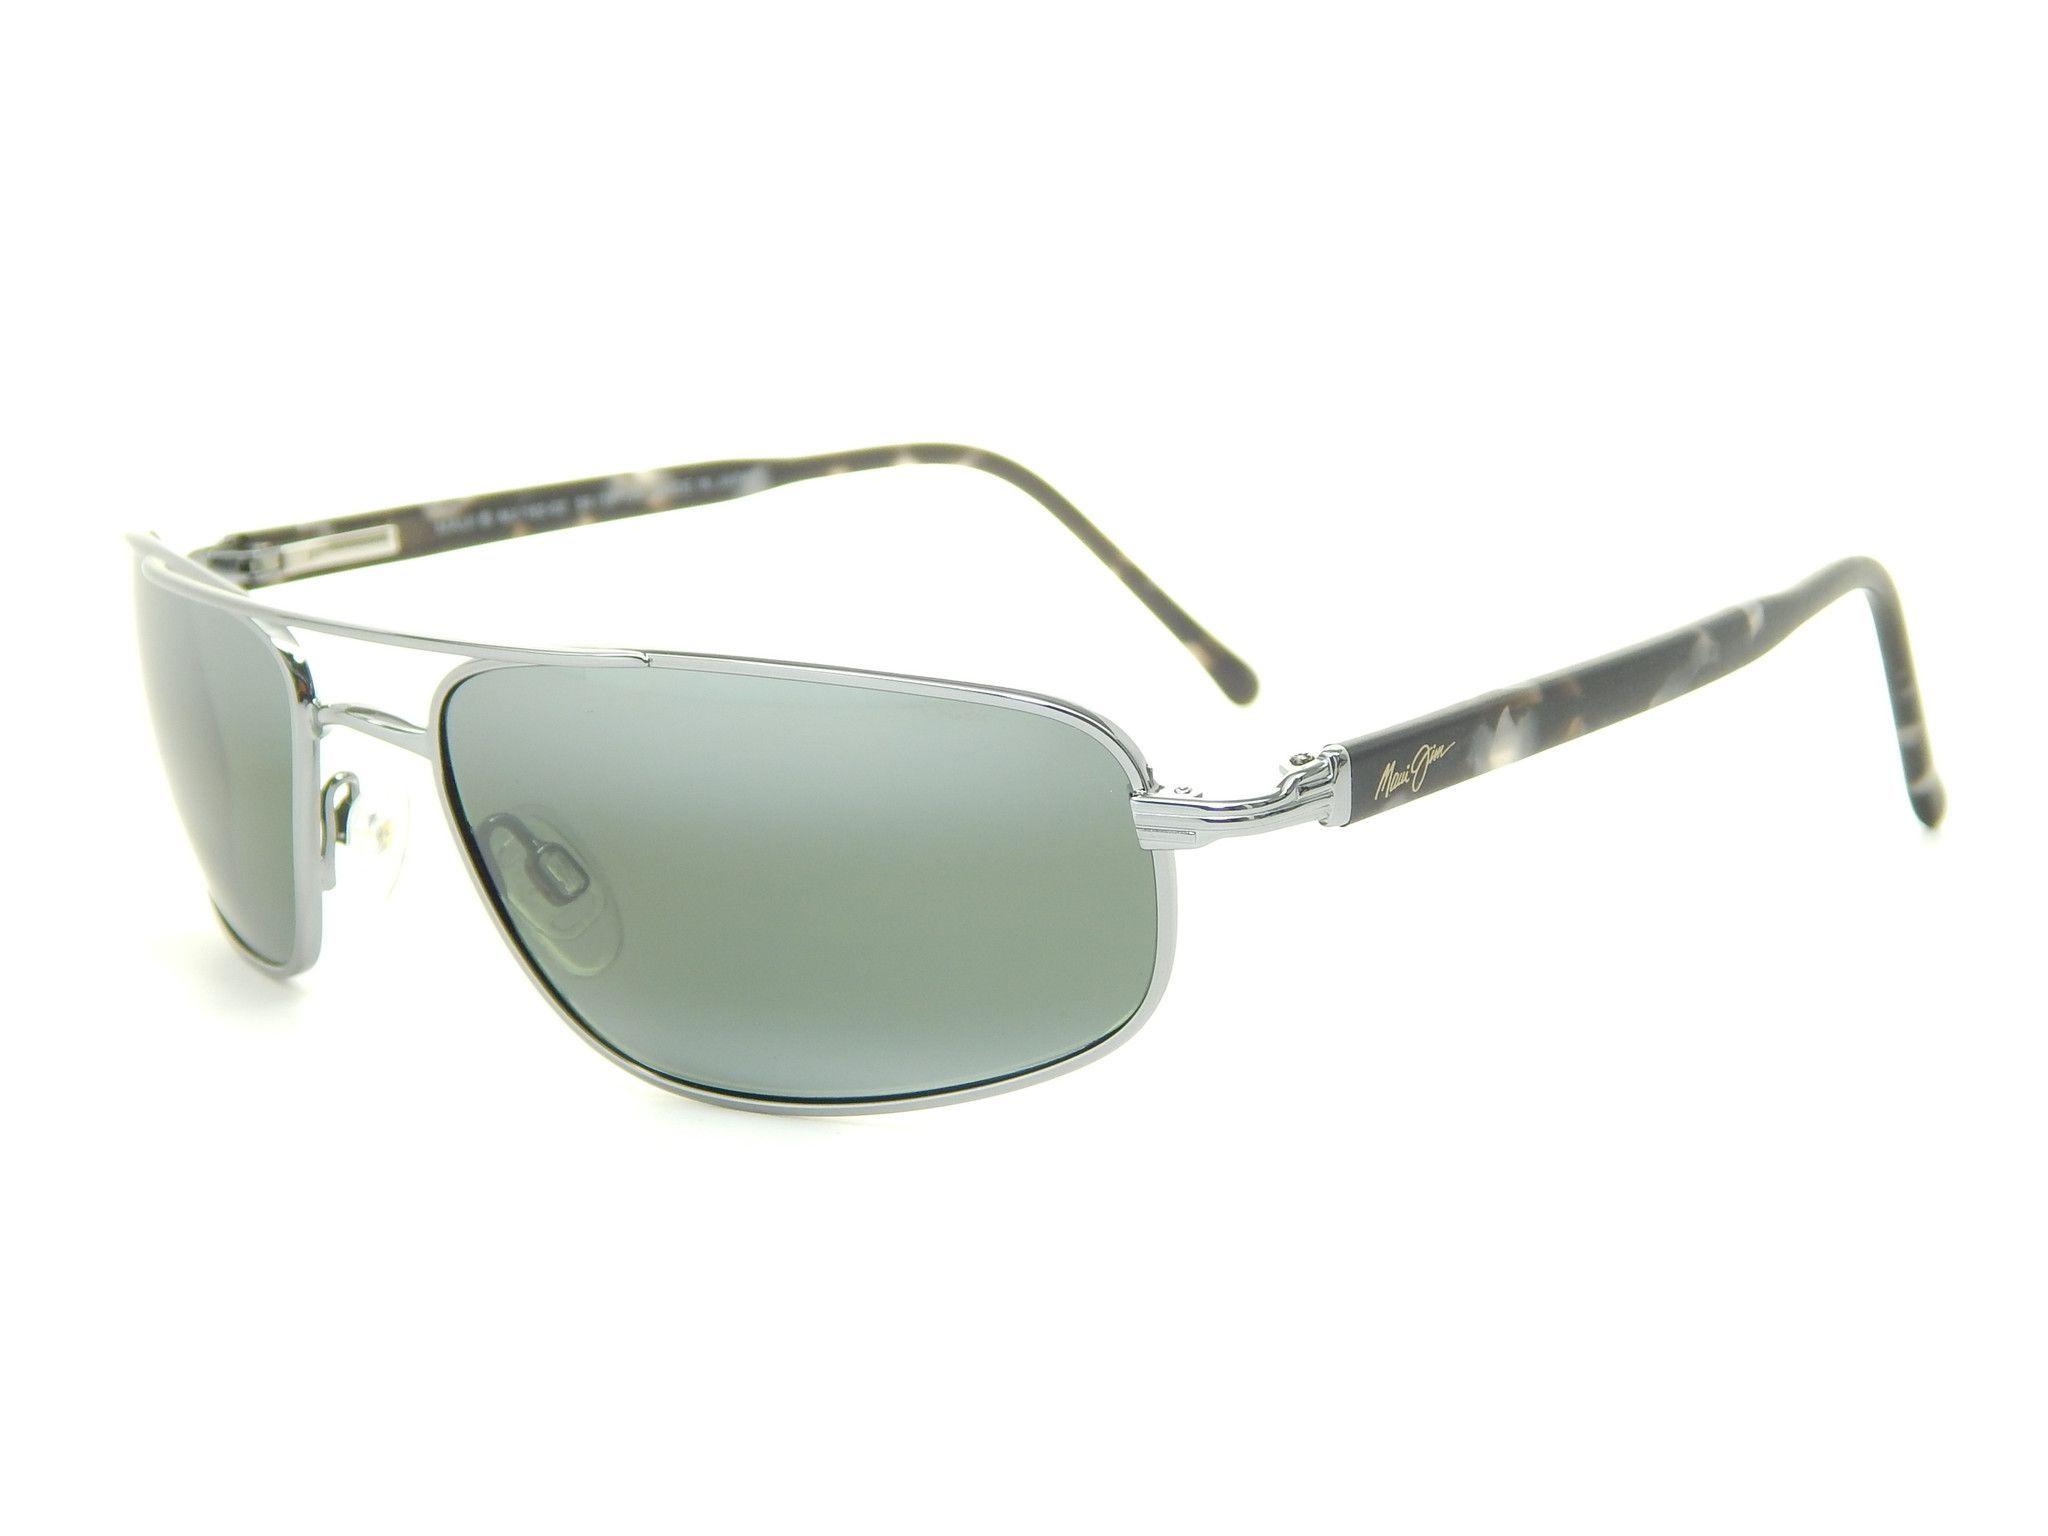 72b8eab3d46a Maui Jim Sunglasses Price List – Southern California Weather Force